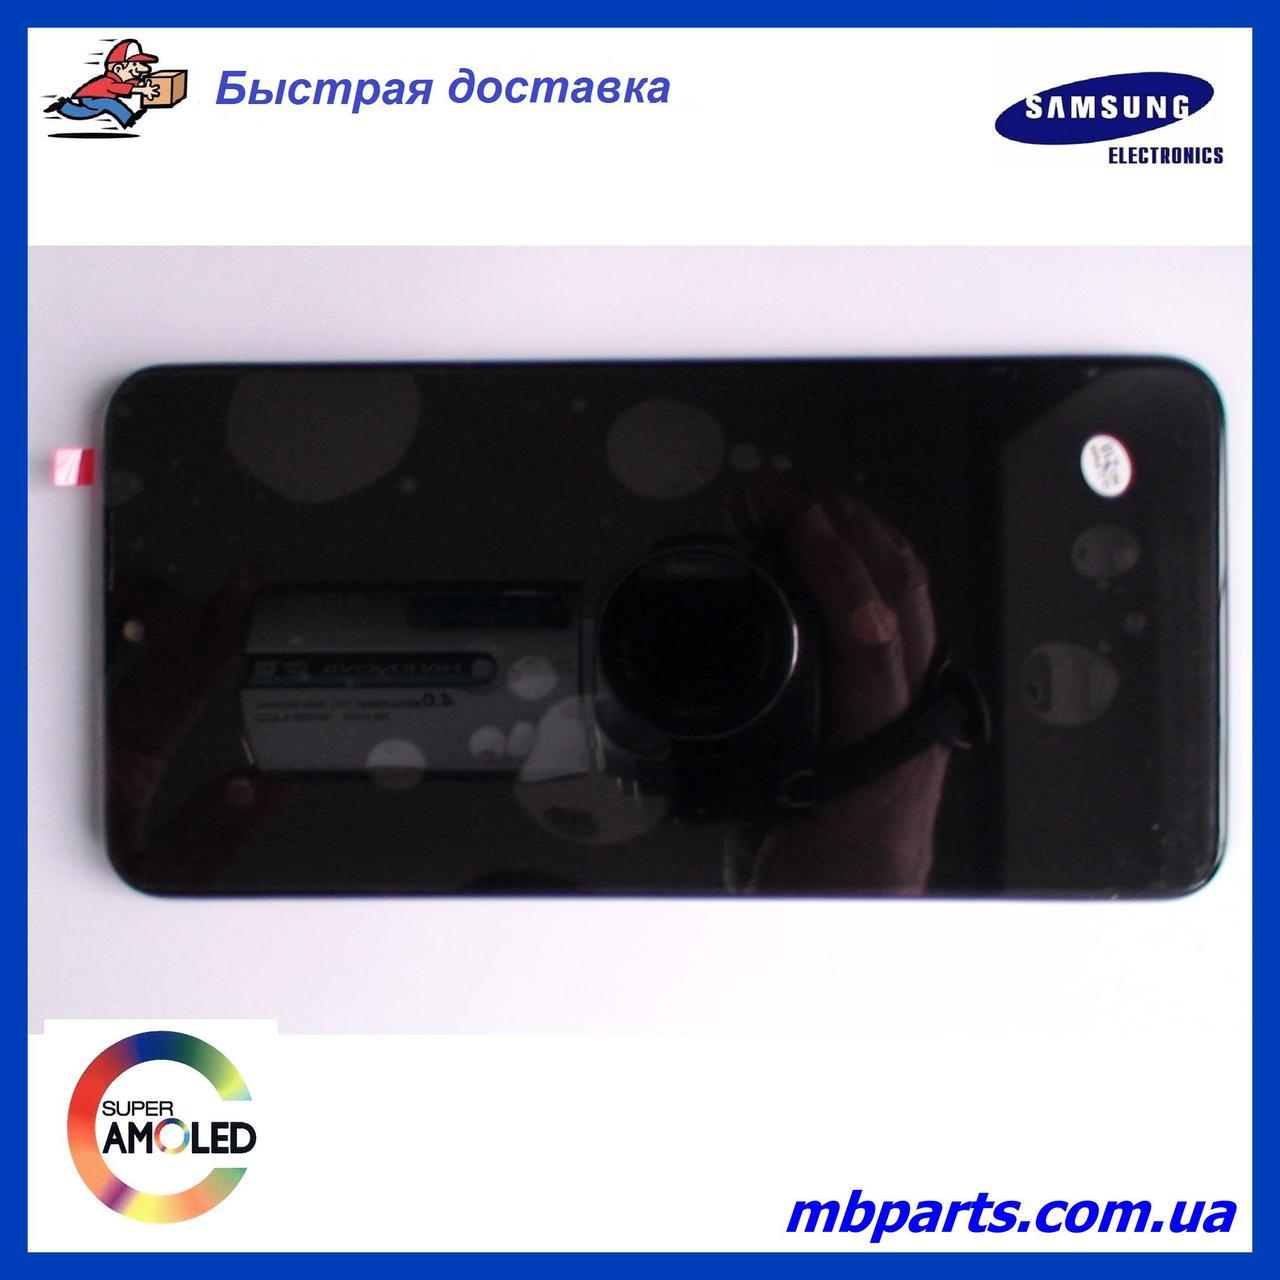 Дисплей с сенсором Samsung А107 Galaxy А10s Black, GH81-17482A, оригинал, с рамкой!